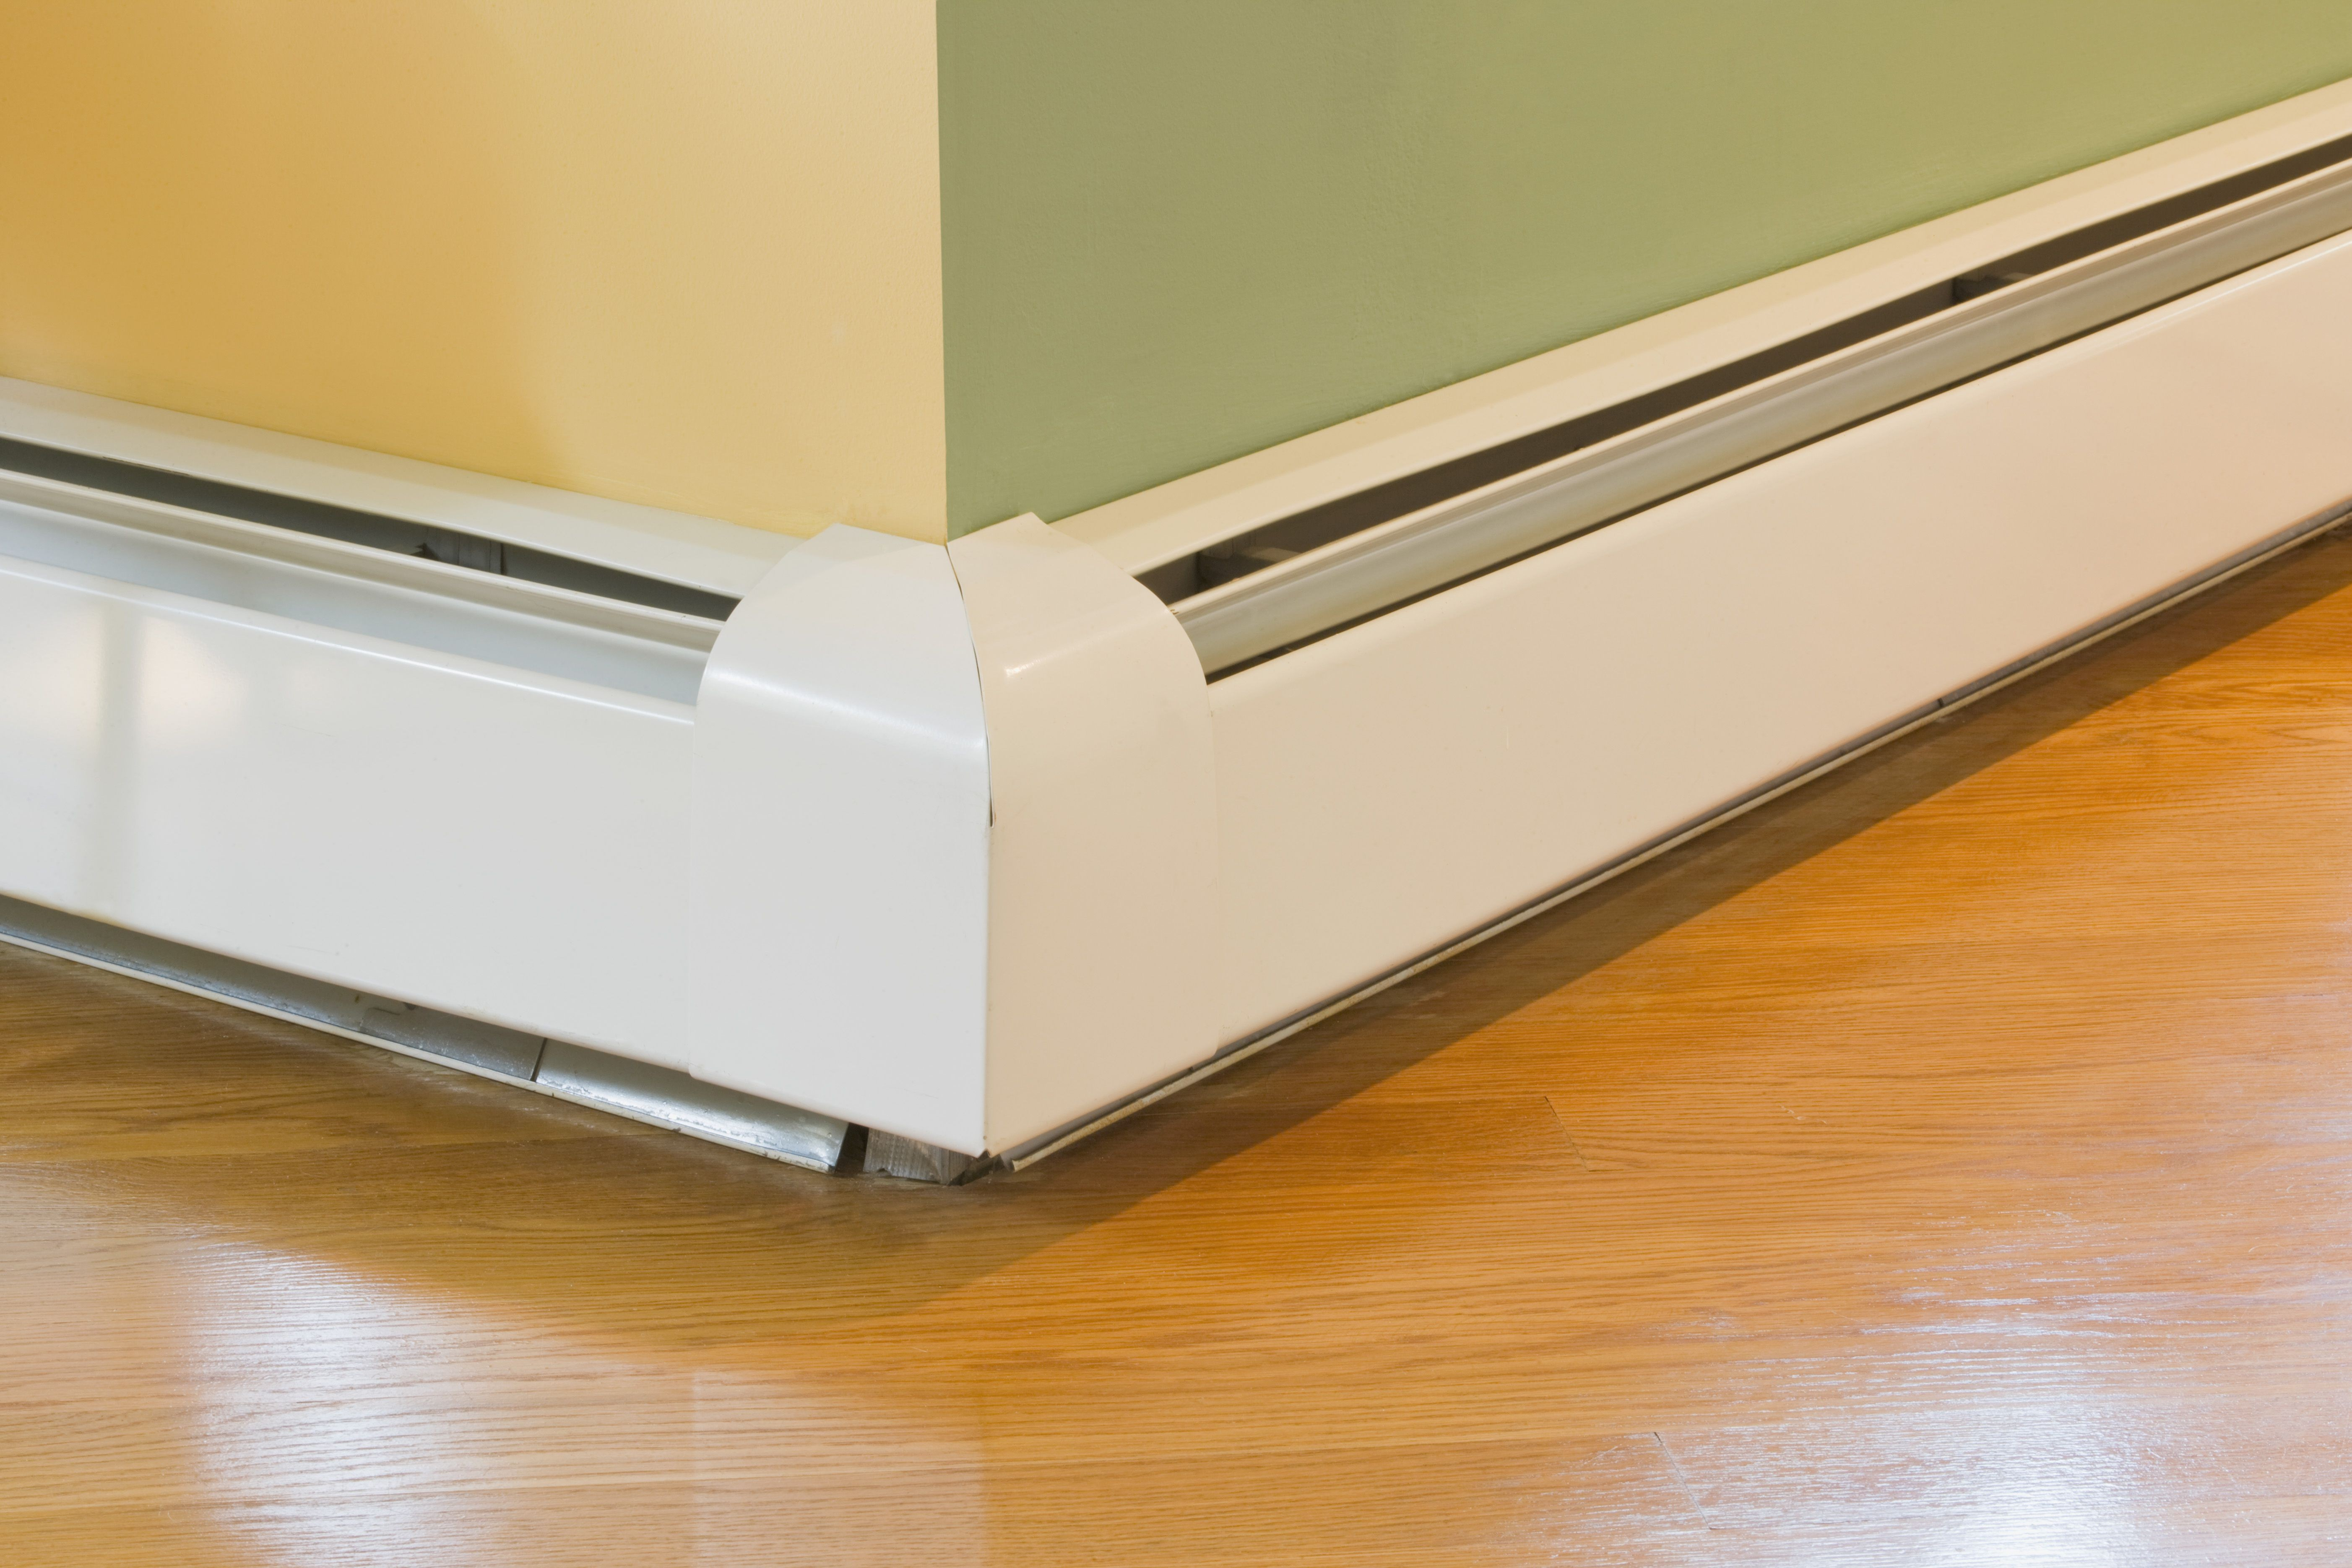 baseboard heater 5845a80c3df78c0230f3090c